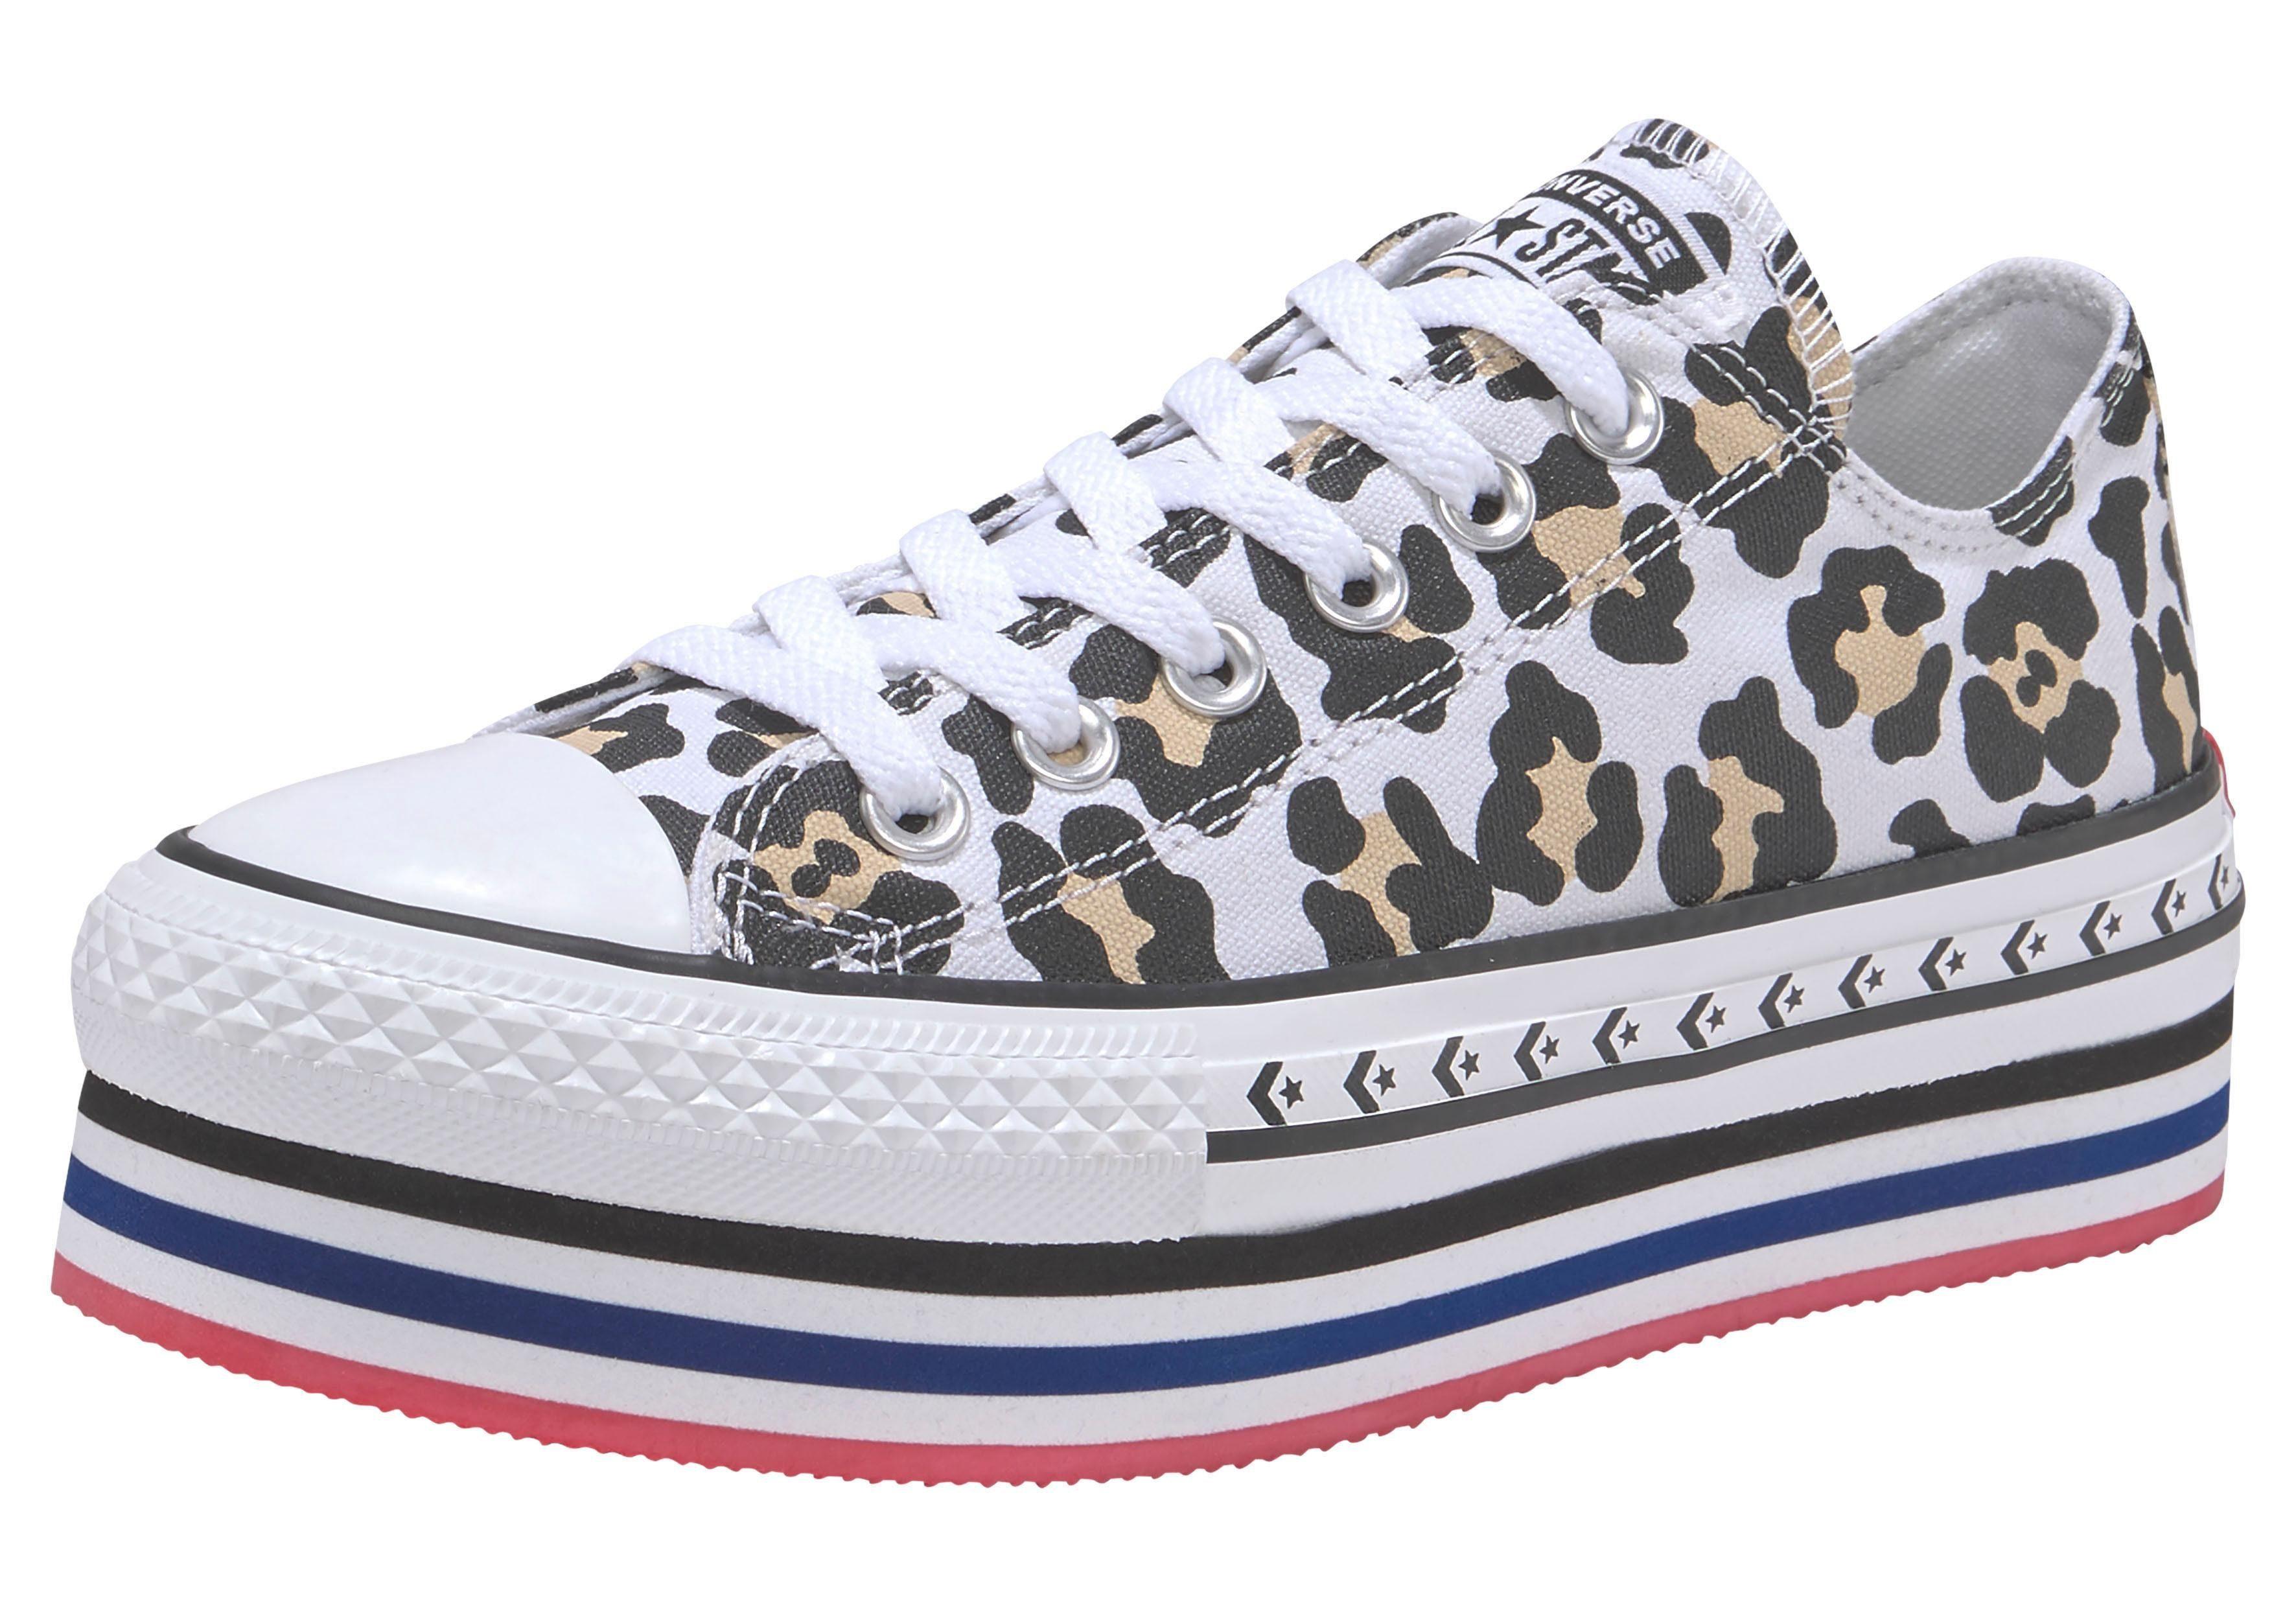 Converse »Chuck Taylor All Star Platform Layer Ox« Sneaker online kaufen | OTTO